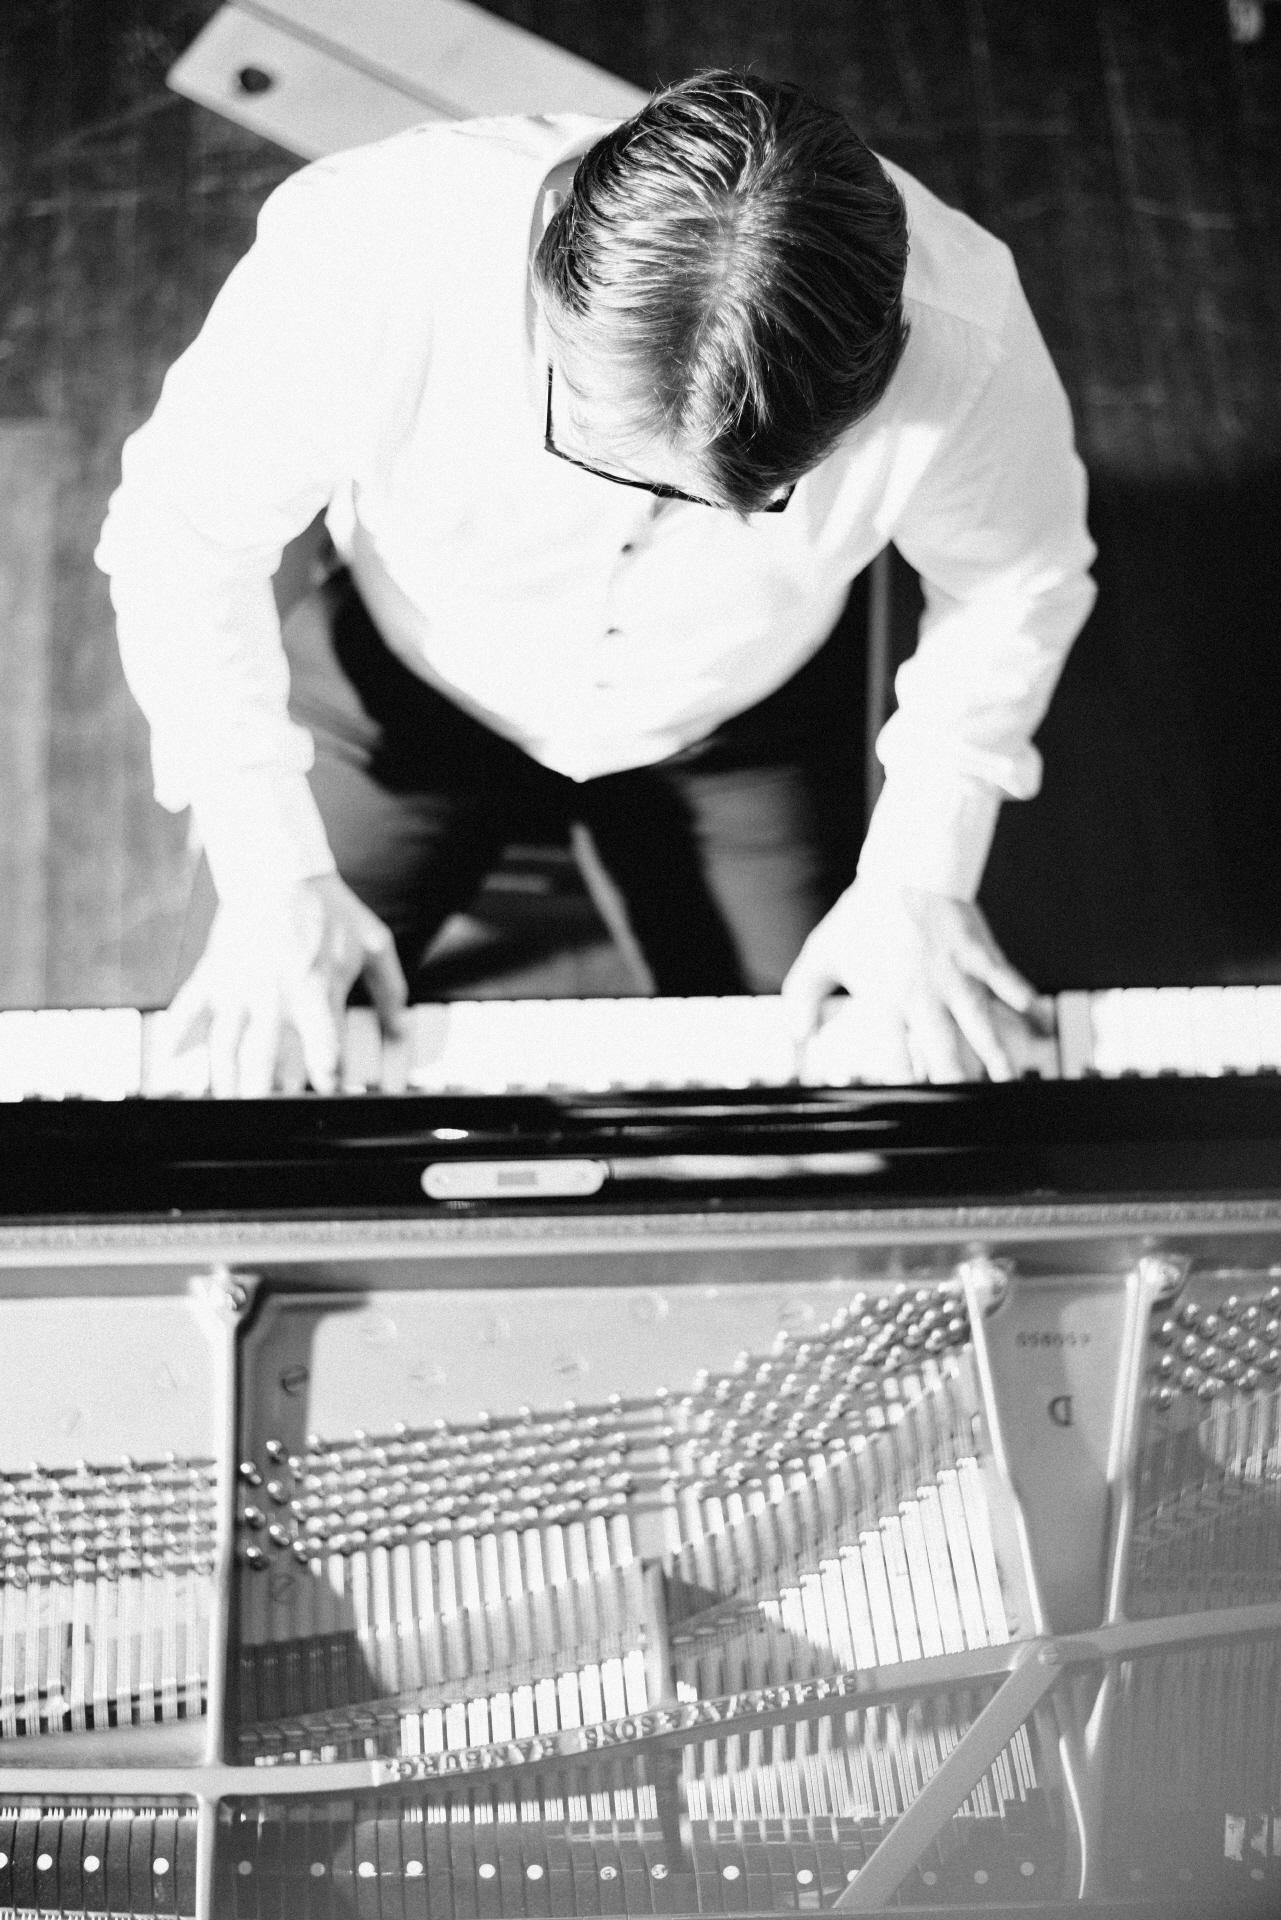 Pianist Alexander Hoell